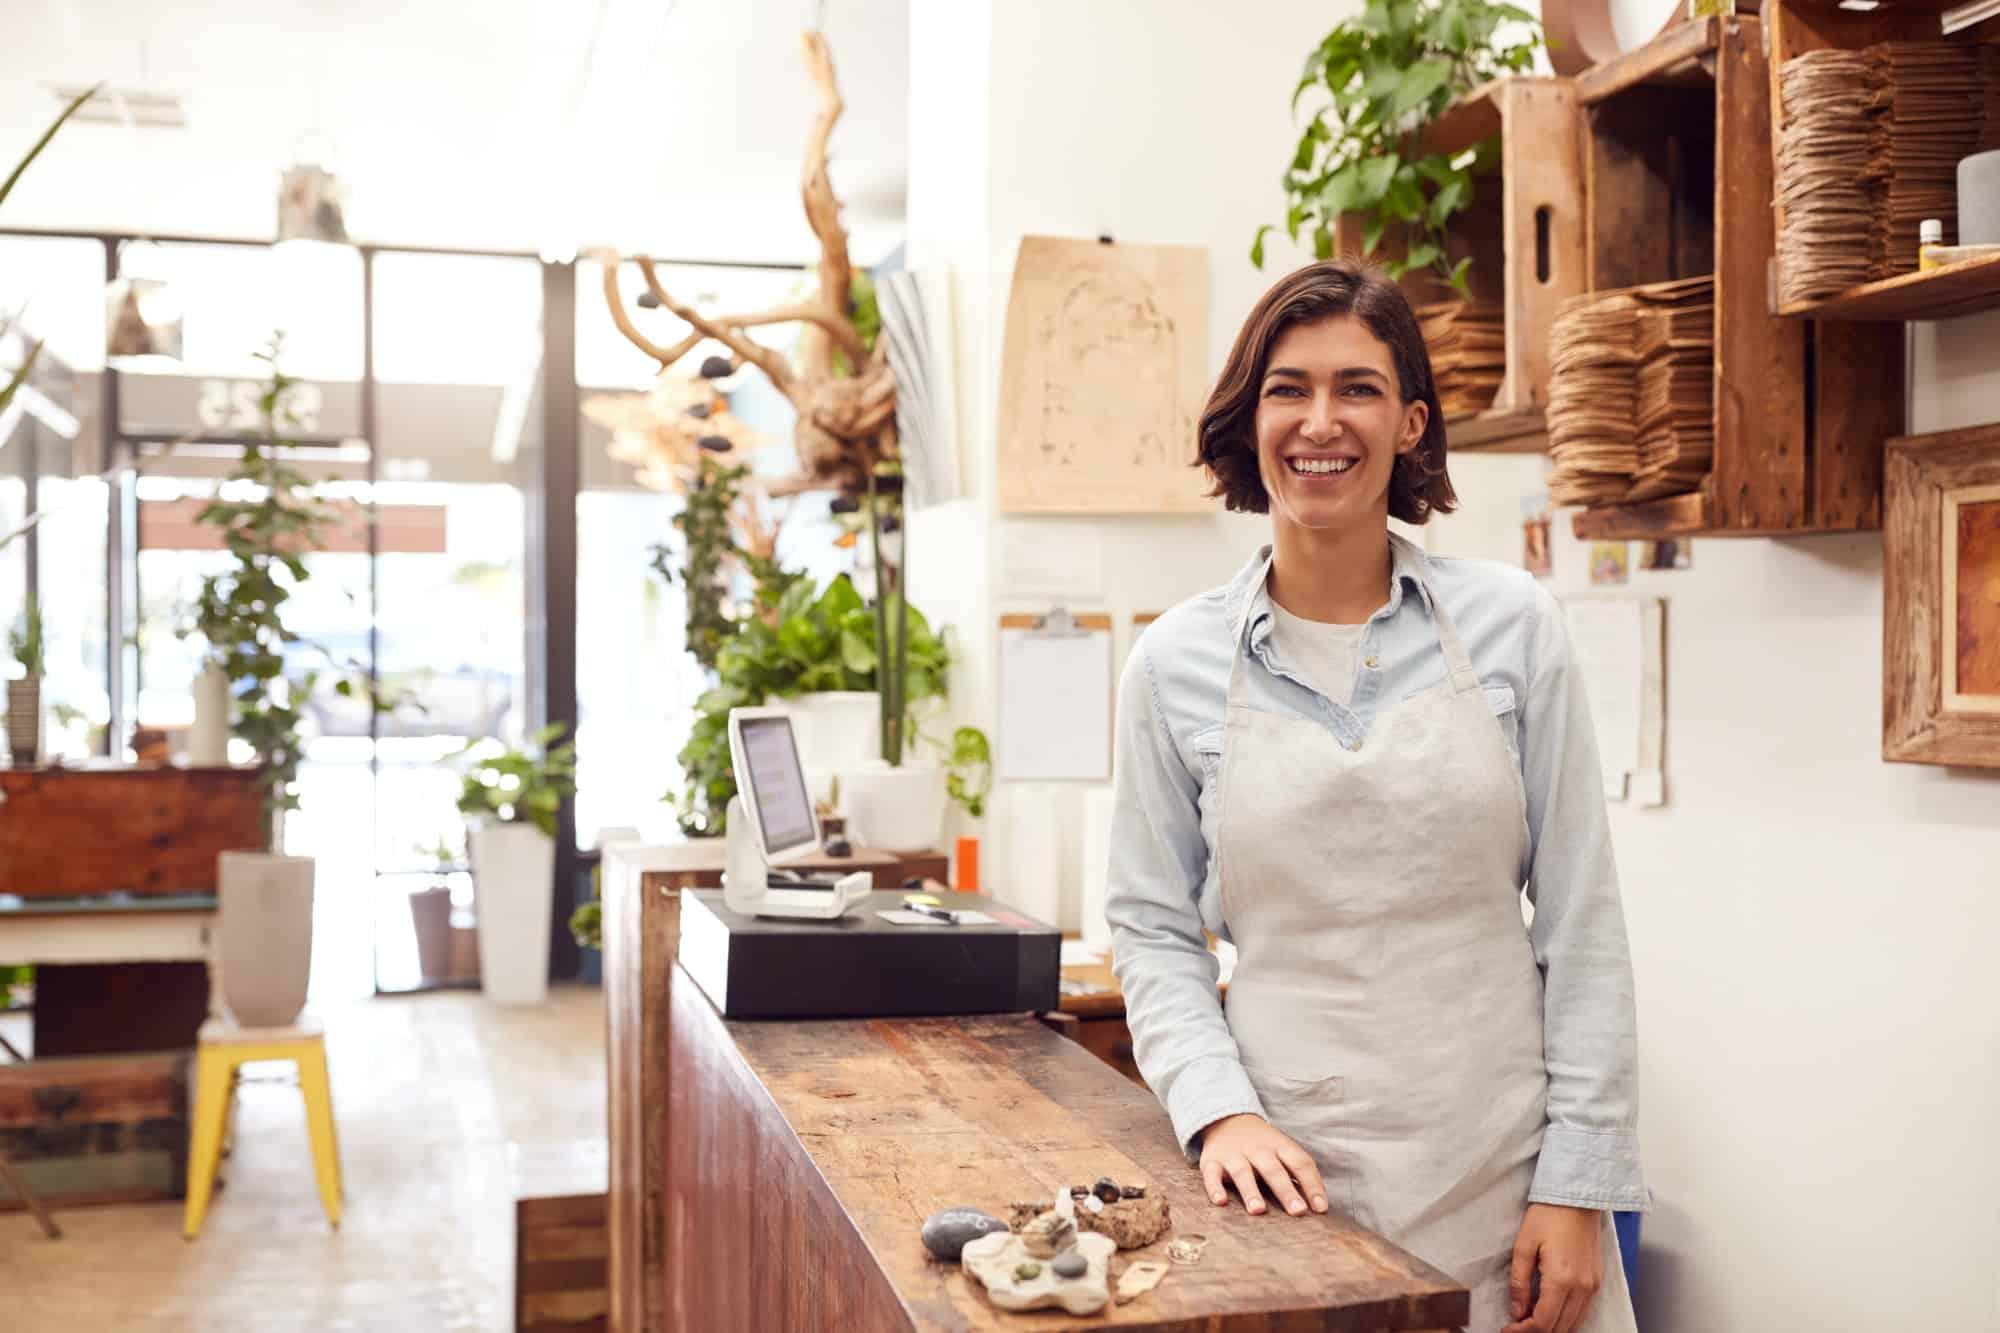 Portrait Of Smiling Female Sales Assistant Standing Behind Sales Desk Of Florists Store